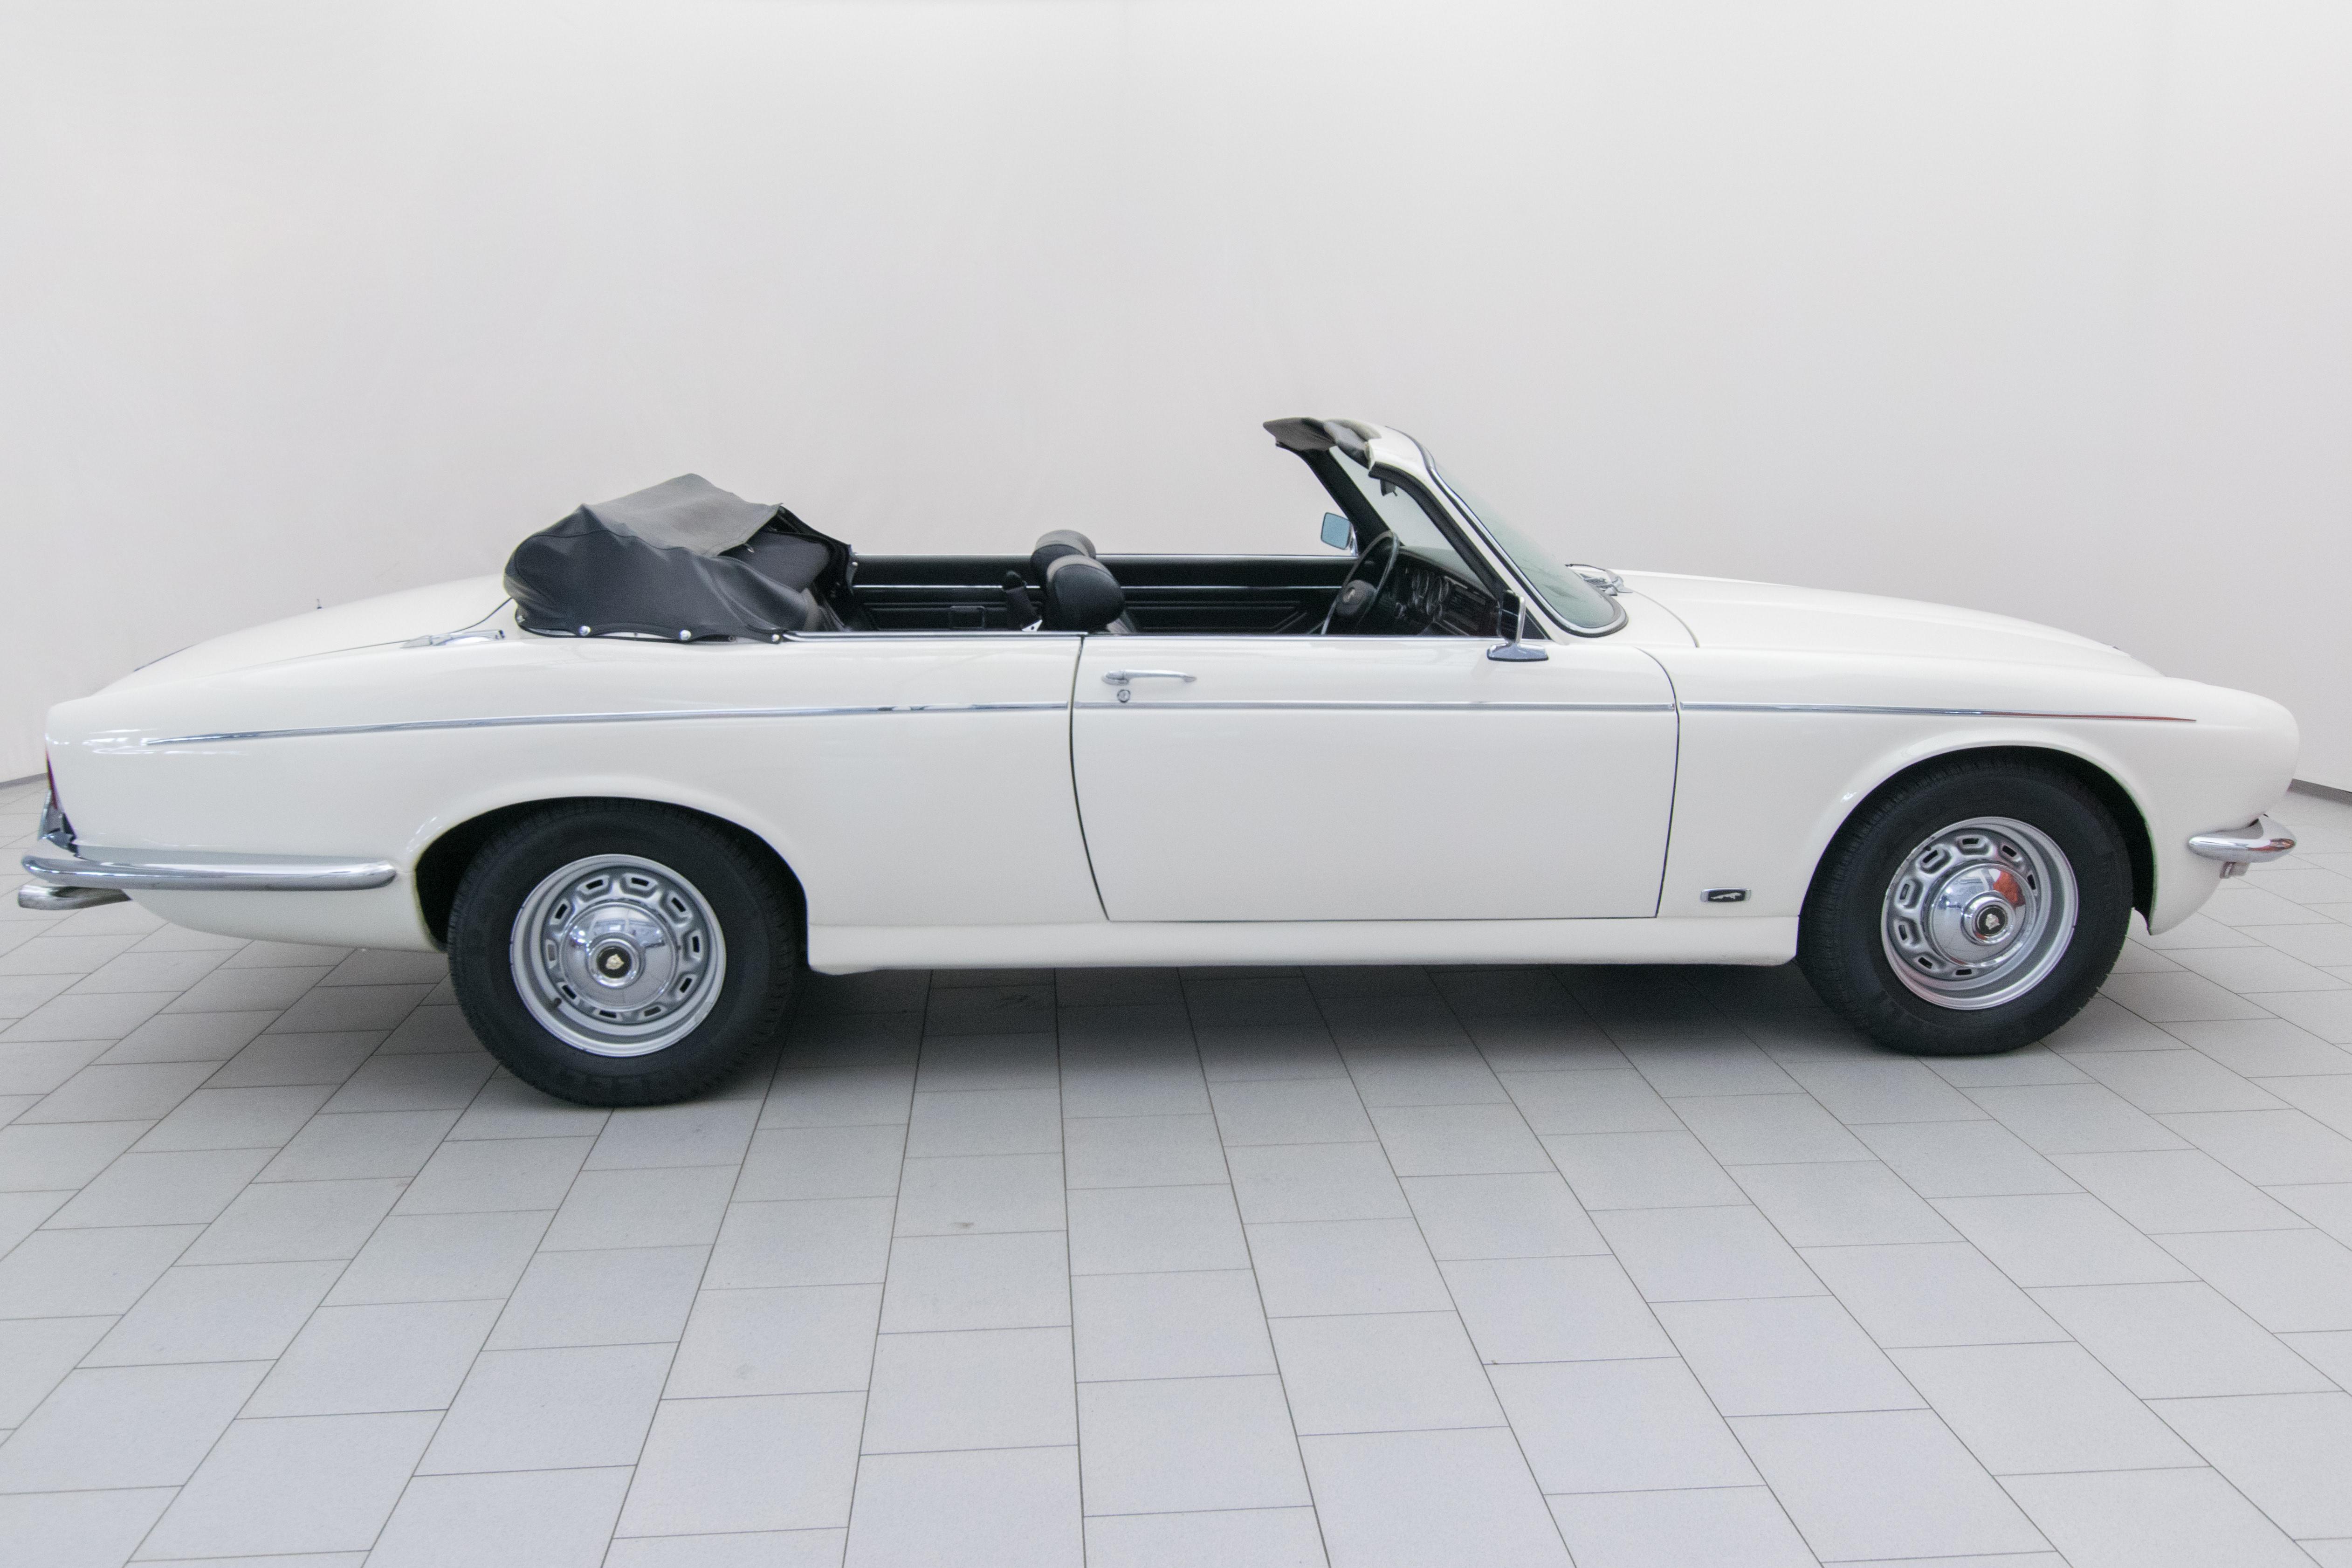 jaguar xj 12 peters cabrio classicbid. Black Bedroom Furniture Sets. Home Design Ideas